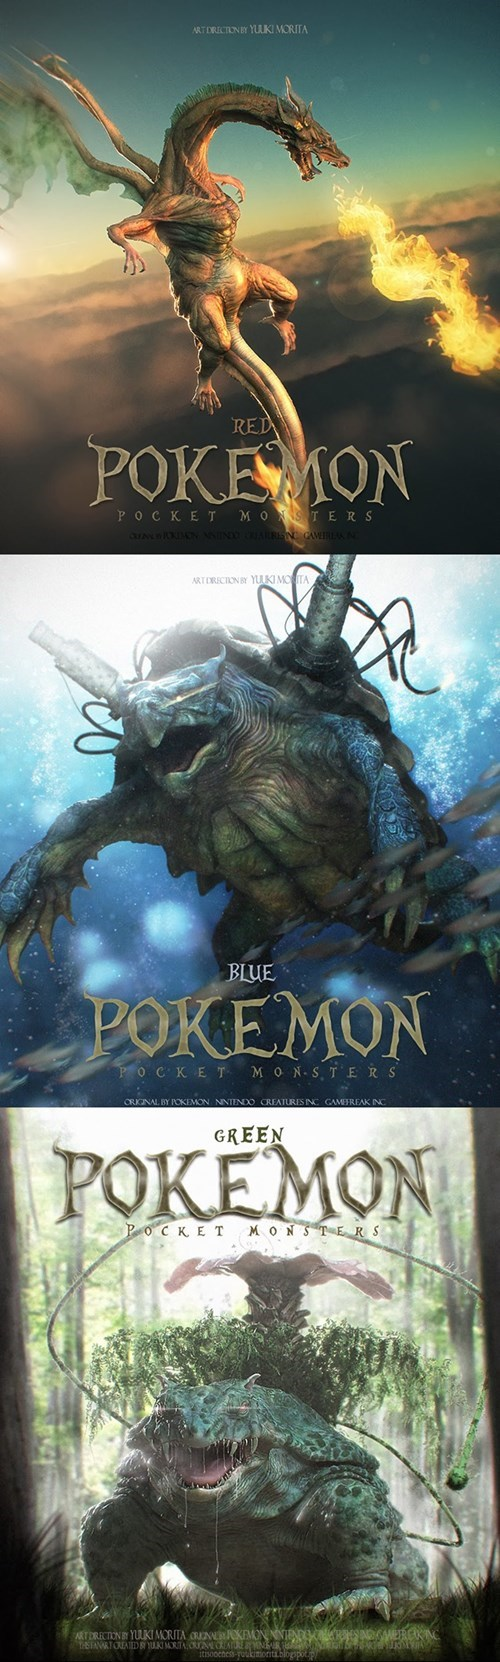 Pokémon,Fan Art,blastoise,charizard,venusaur